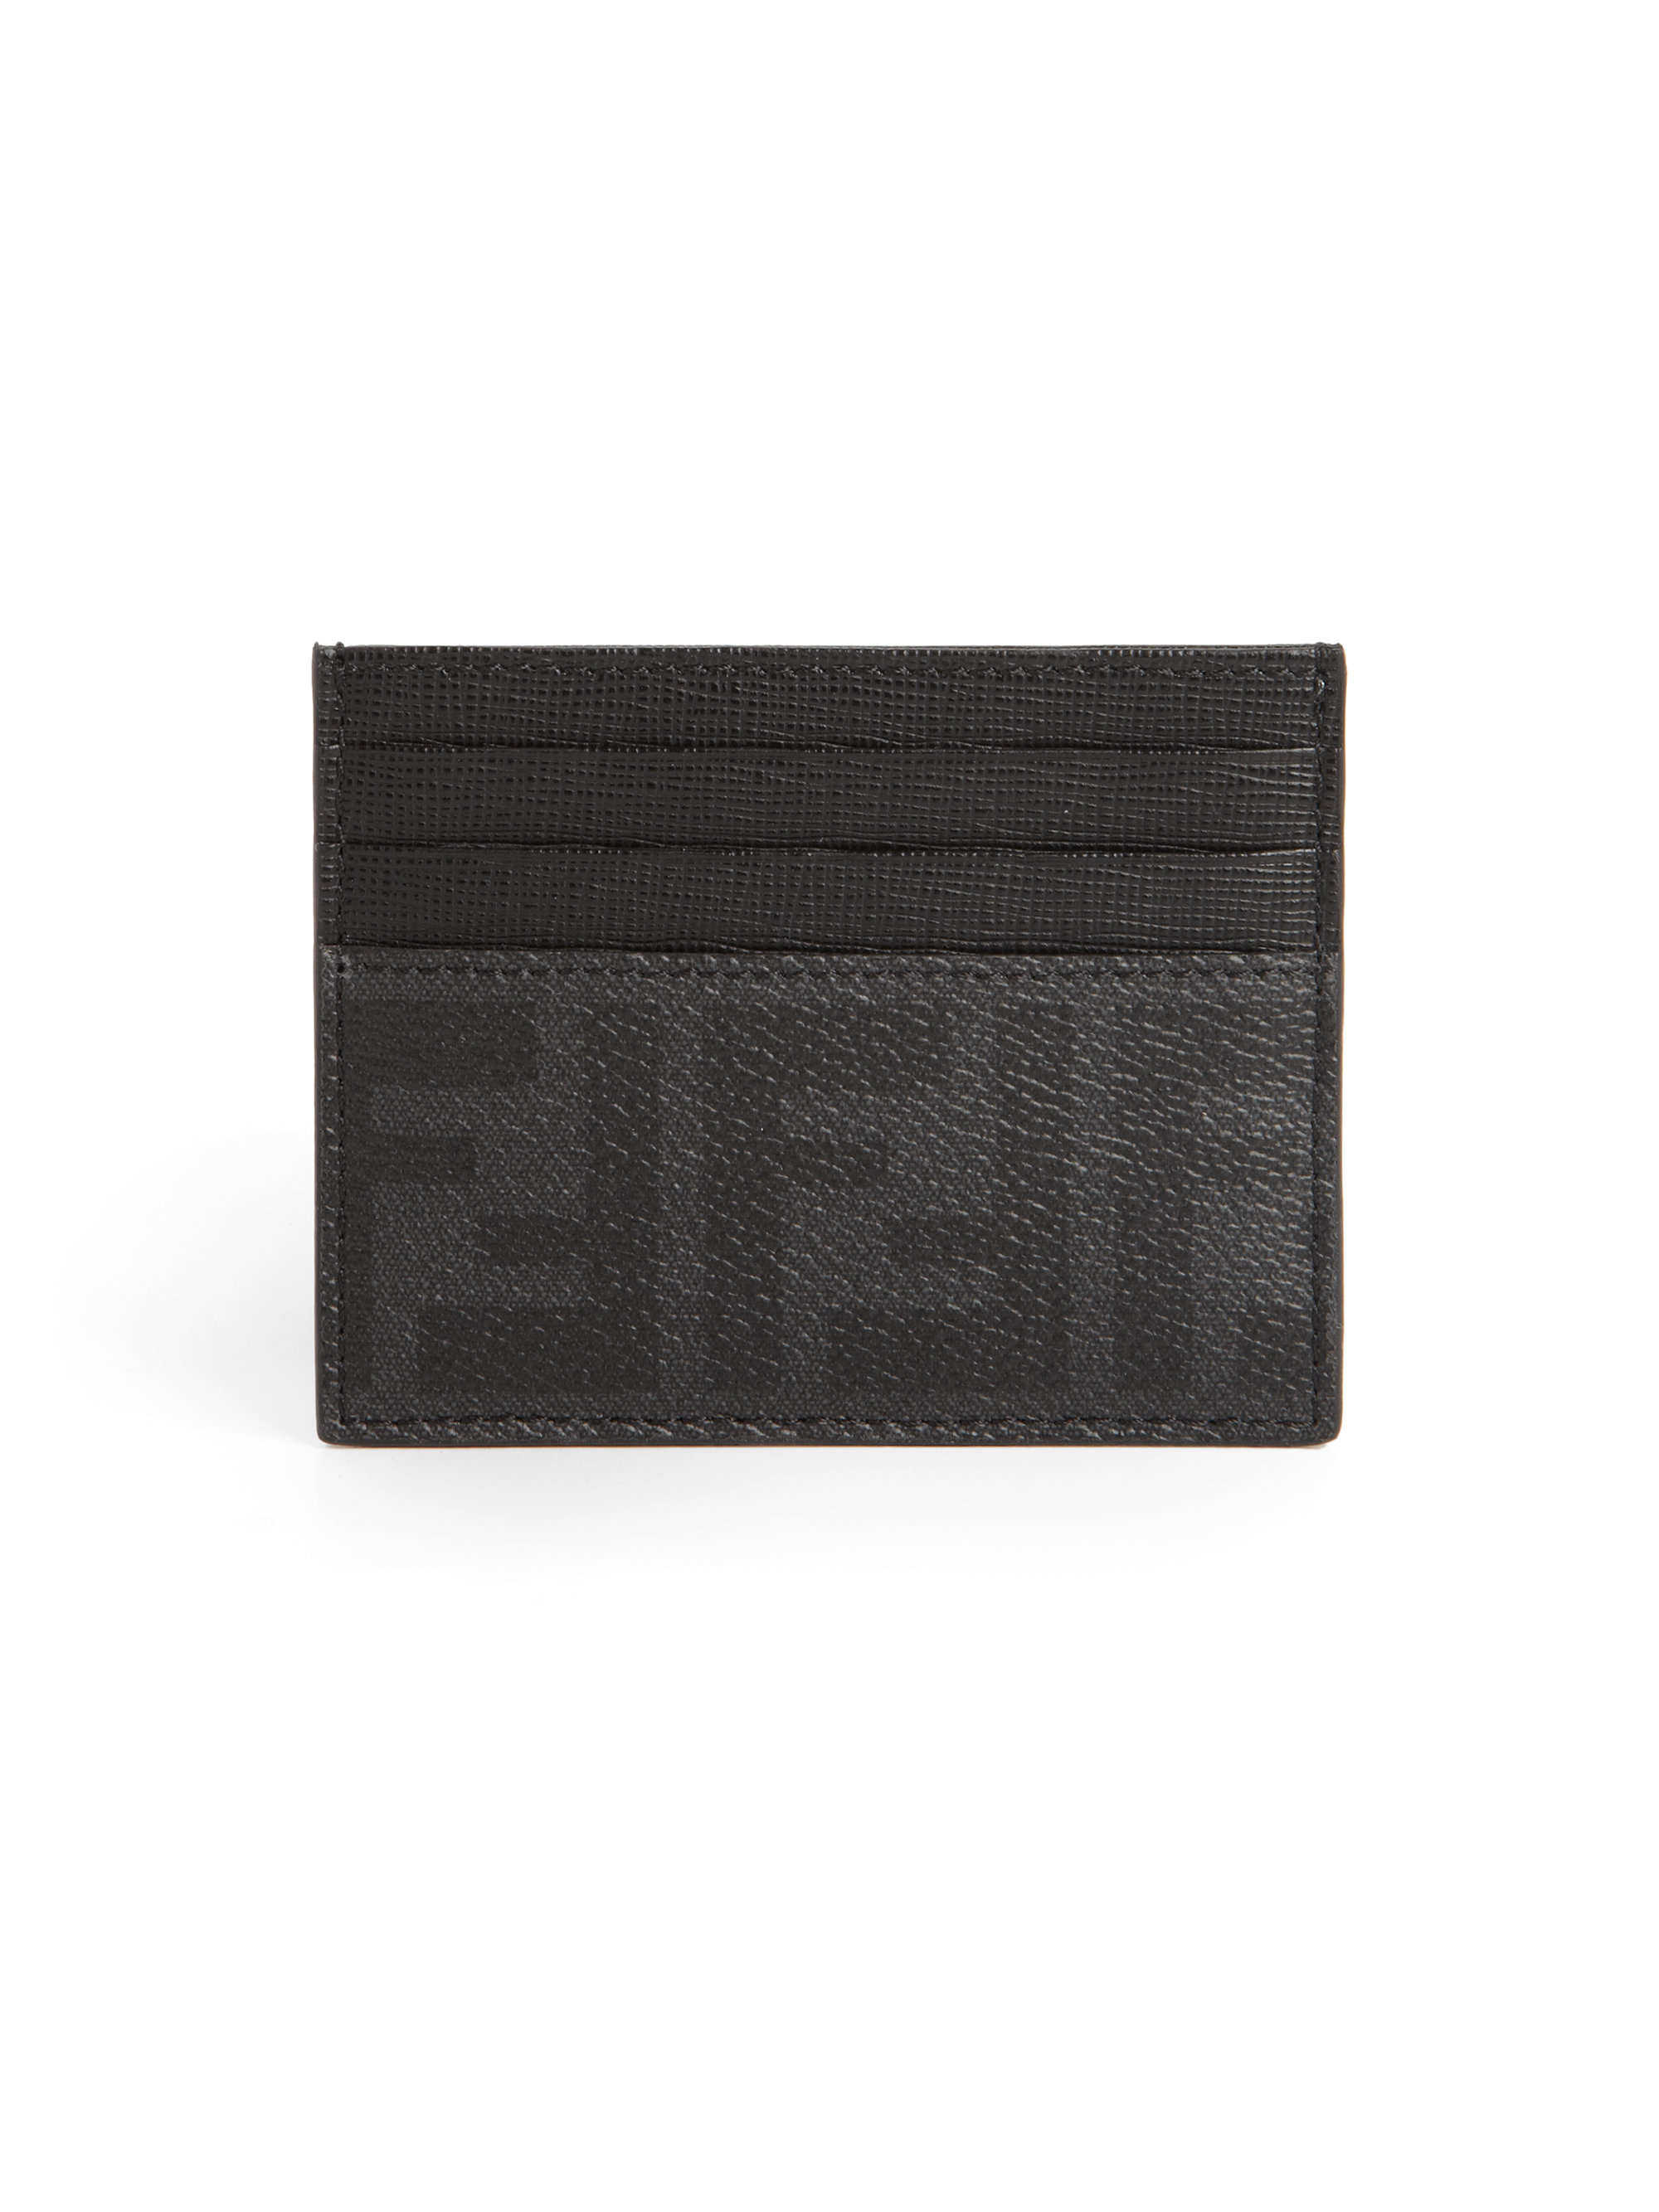 4c39c4331d Fendi Black Zucca Card Case for men